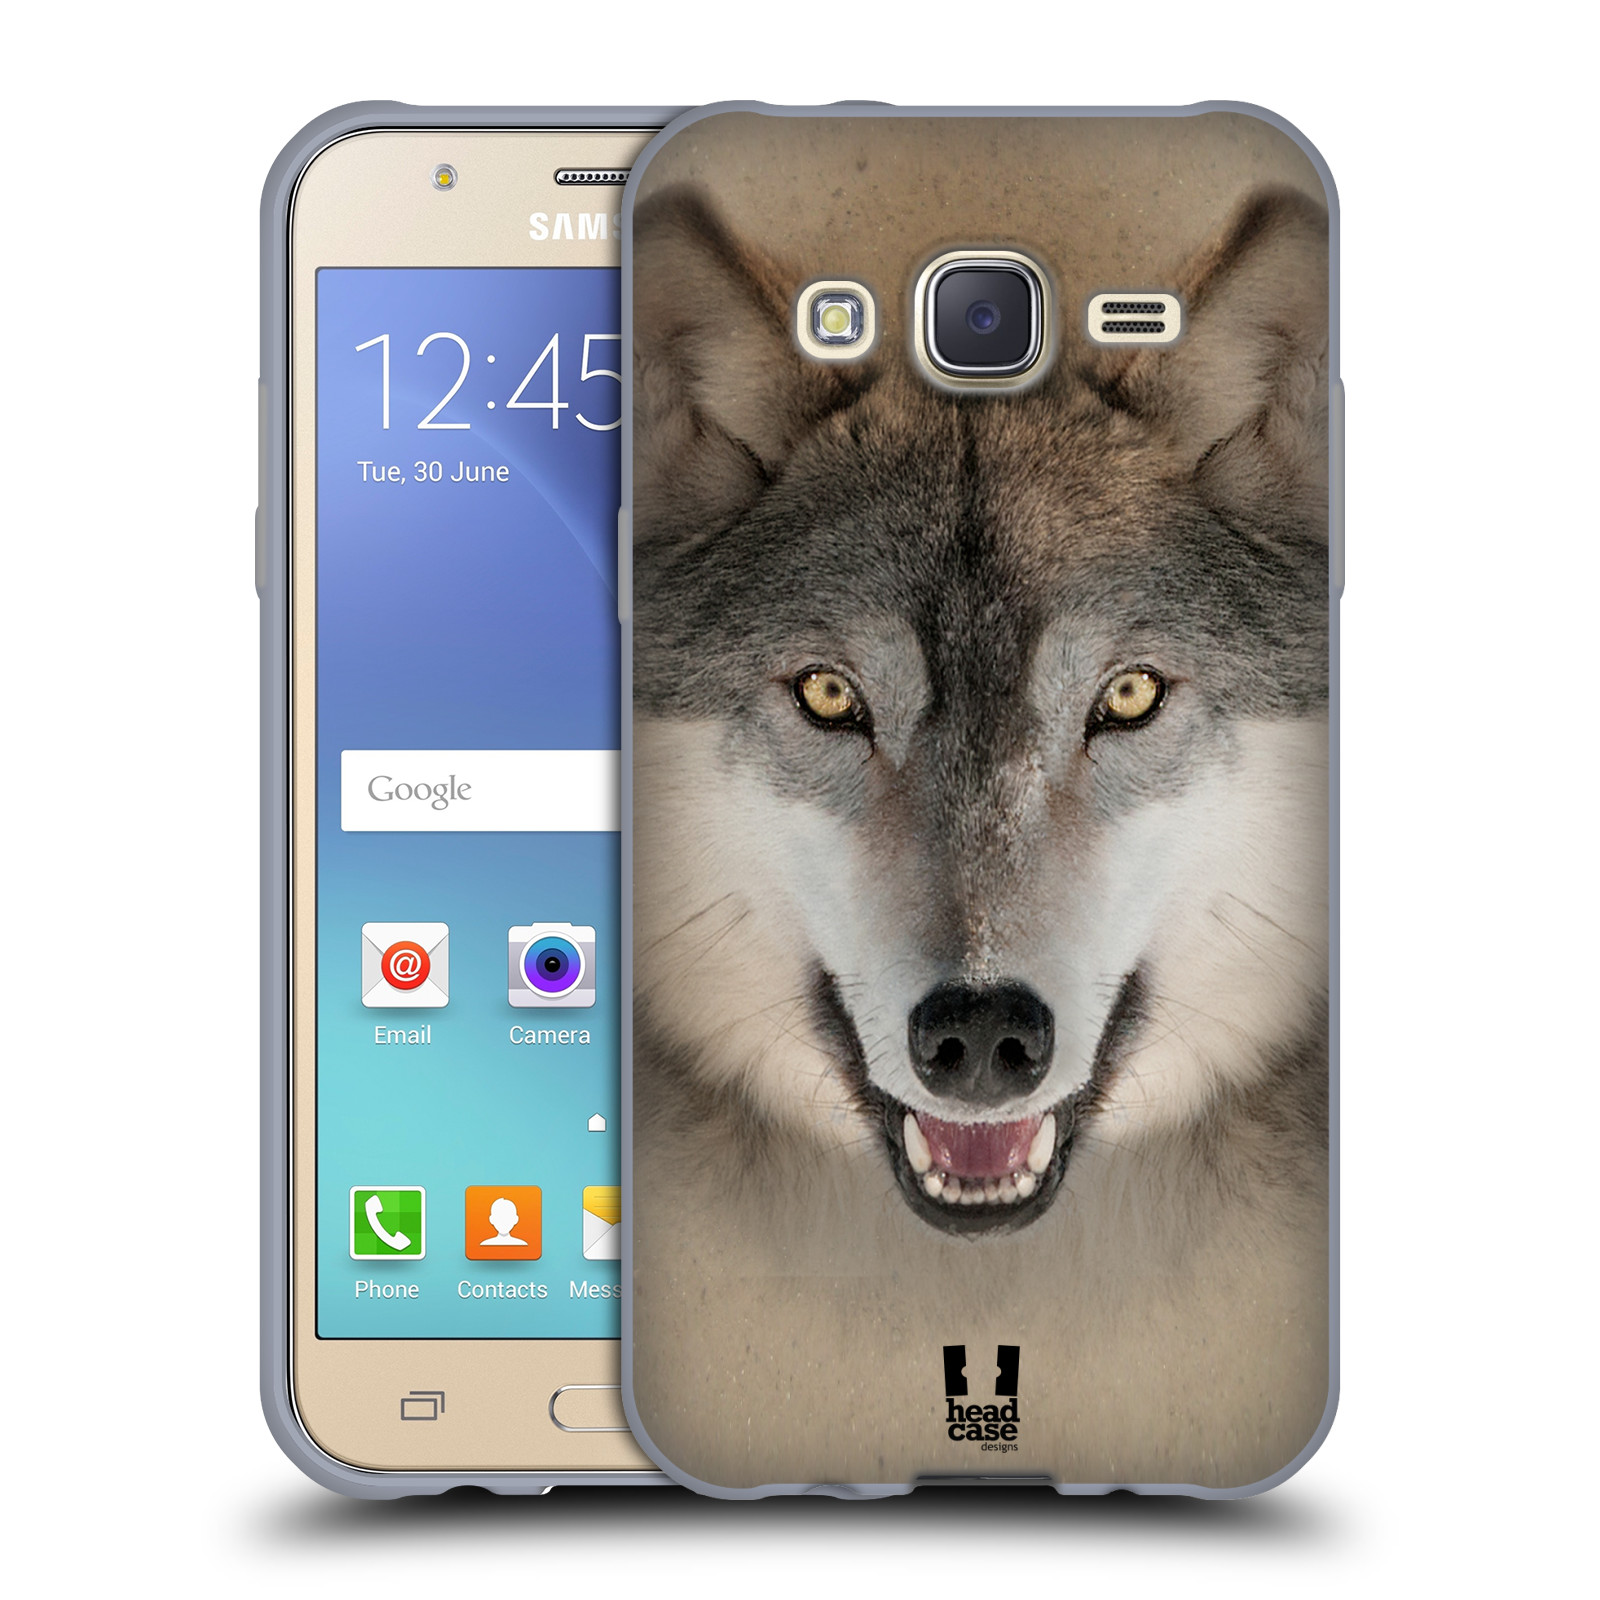 HEAD CASE silikonový obal na mobil Samsung Galaxy J5, J500, (J5 DUOS) vzor Zvířecí tváře 2 vlk šedý